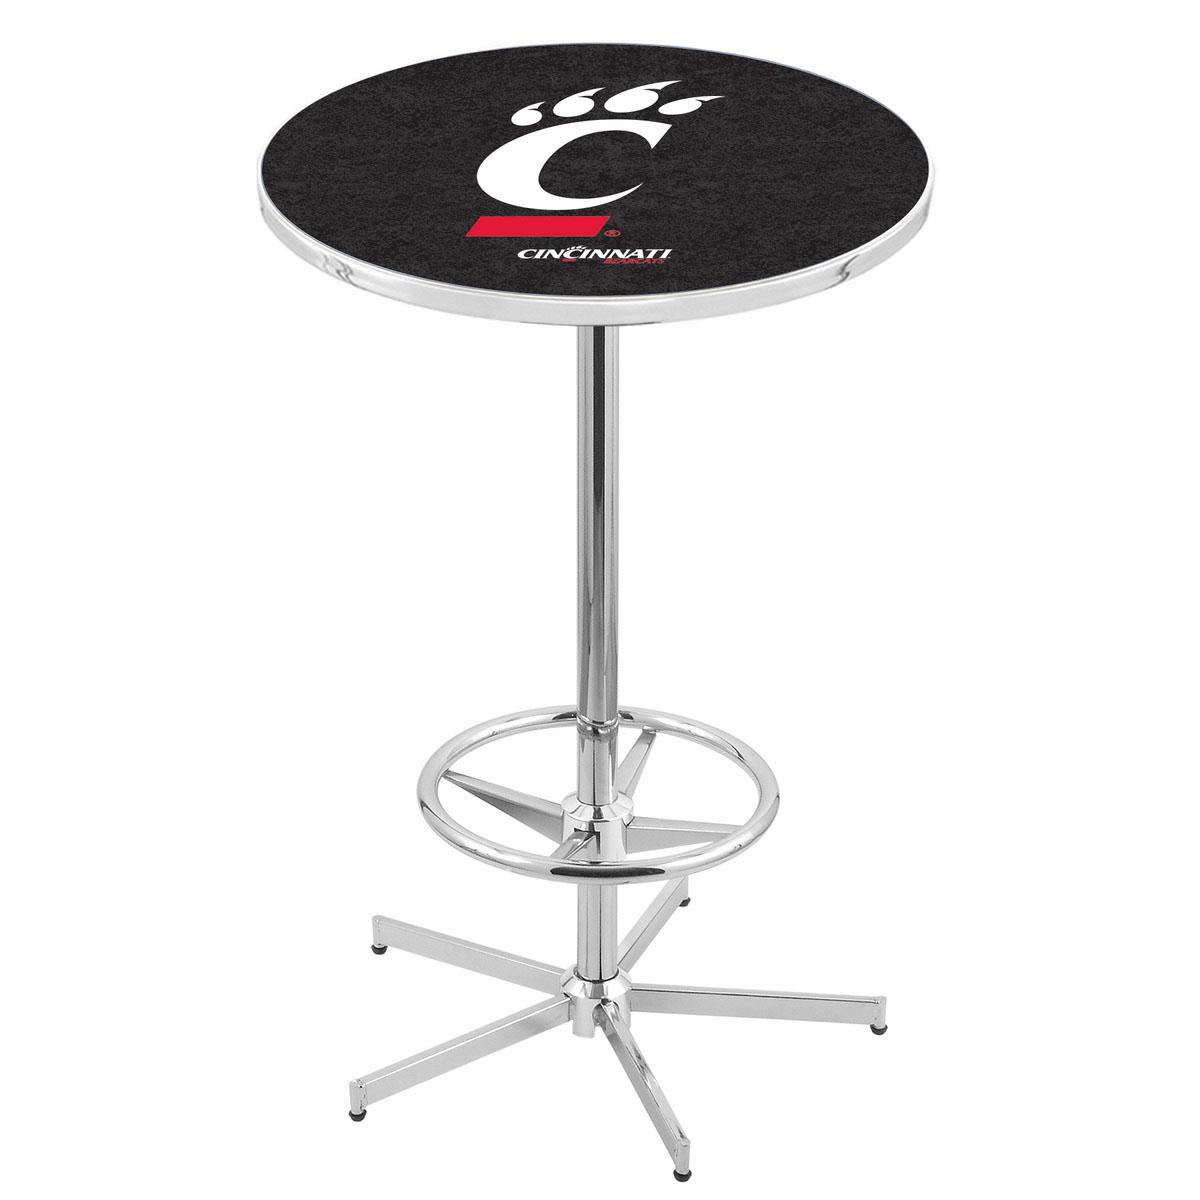 User friendly Chrome Cincinnati Pub Table Product Photo